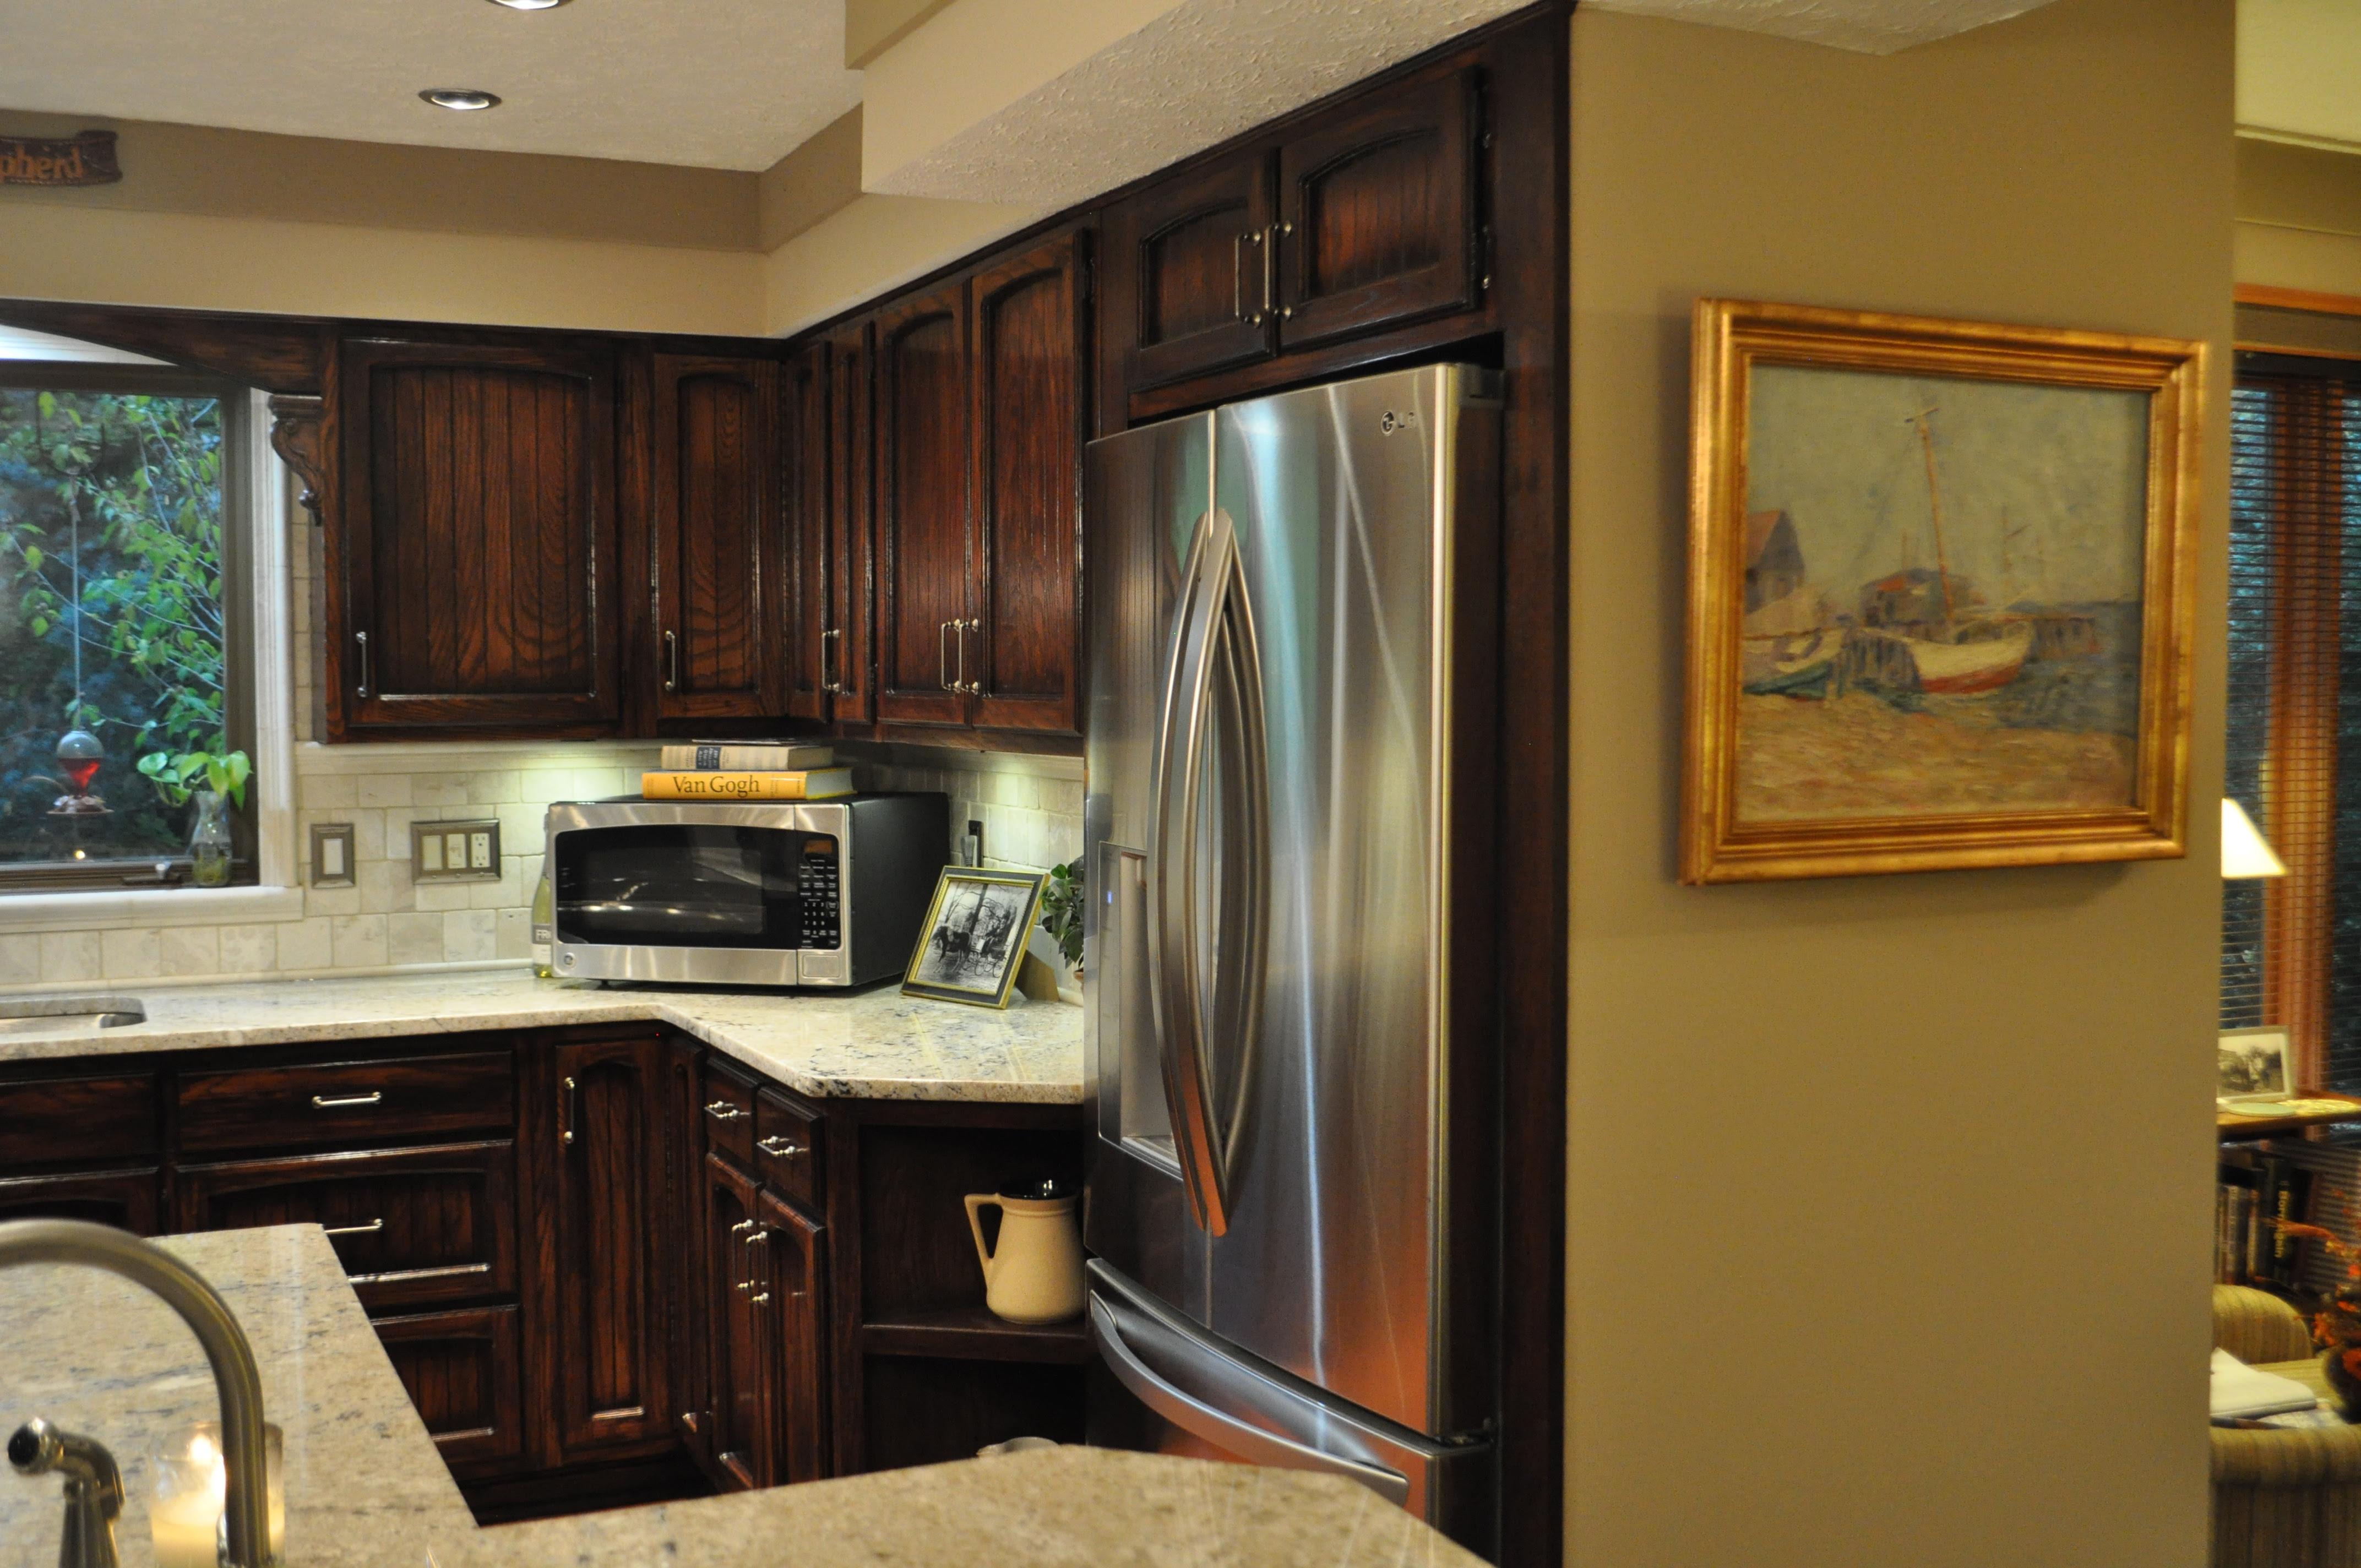 Kitchen Cabinets Over Refrigerator